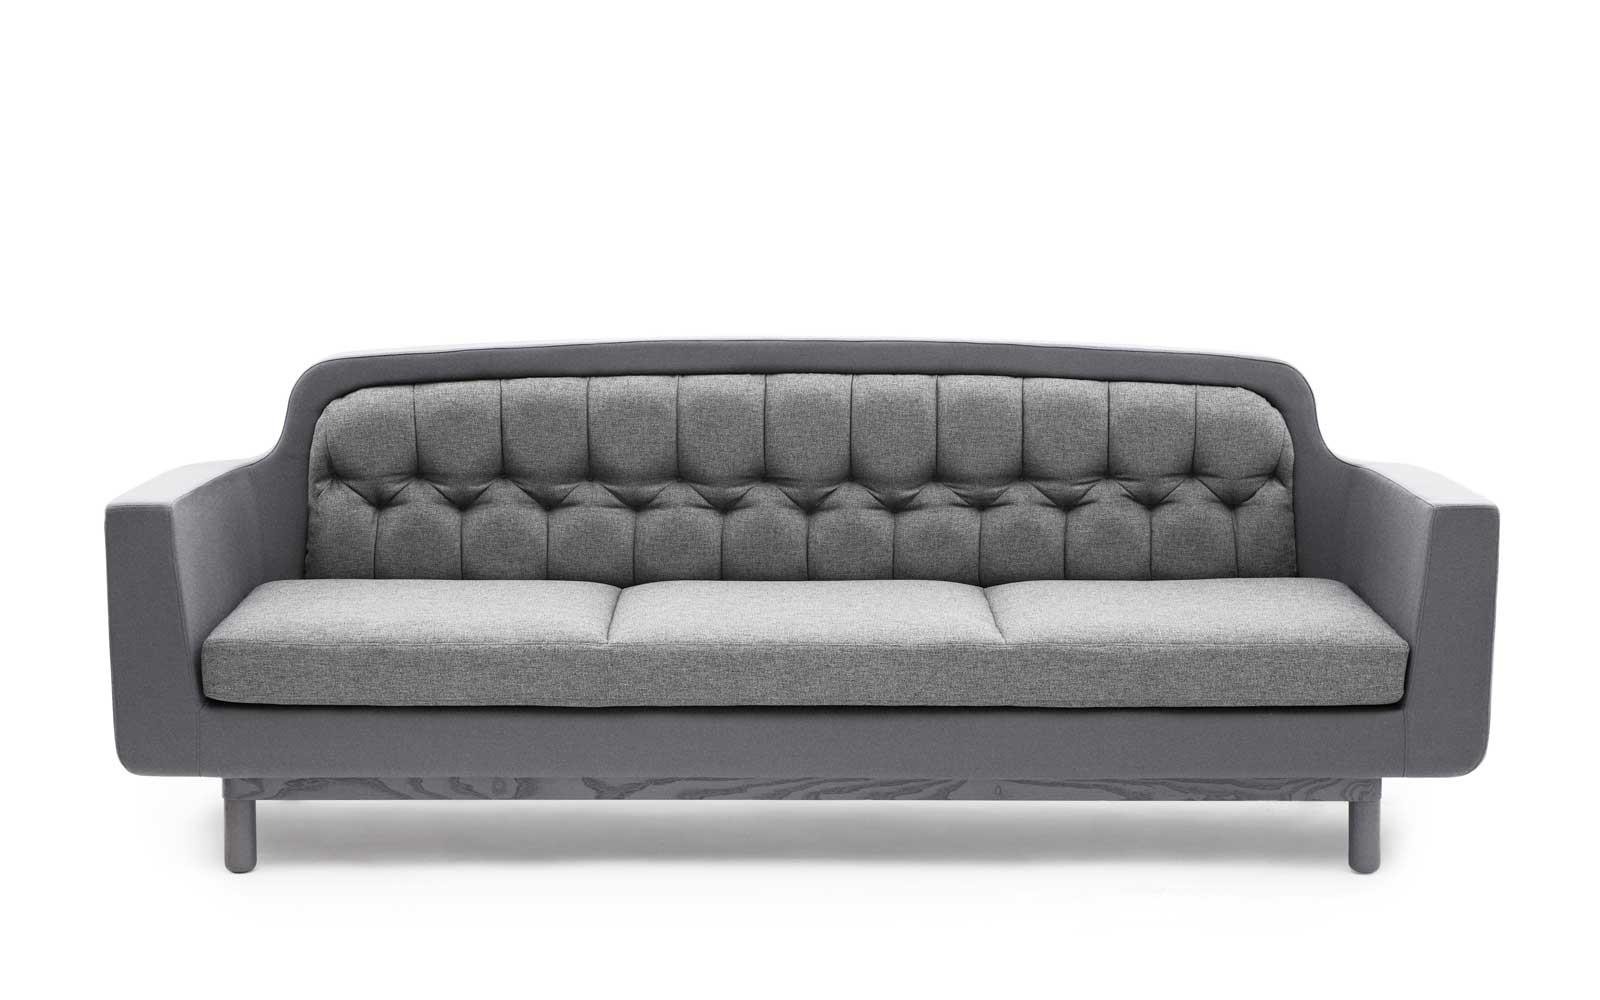 sofa shampoo wash hyderabad dallas cowboys pub contemporary furniture in clean minimalistic design